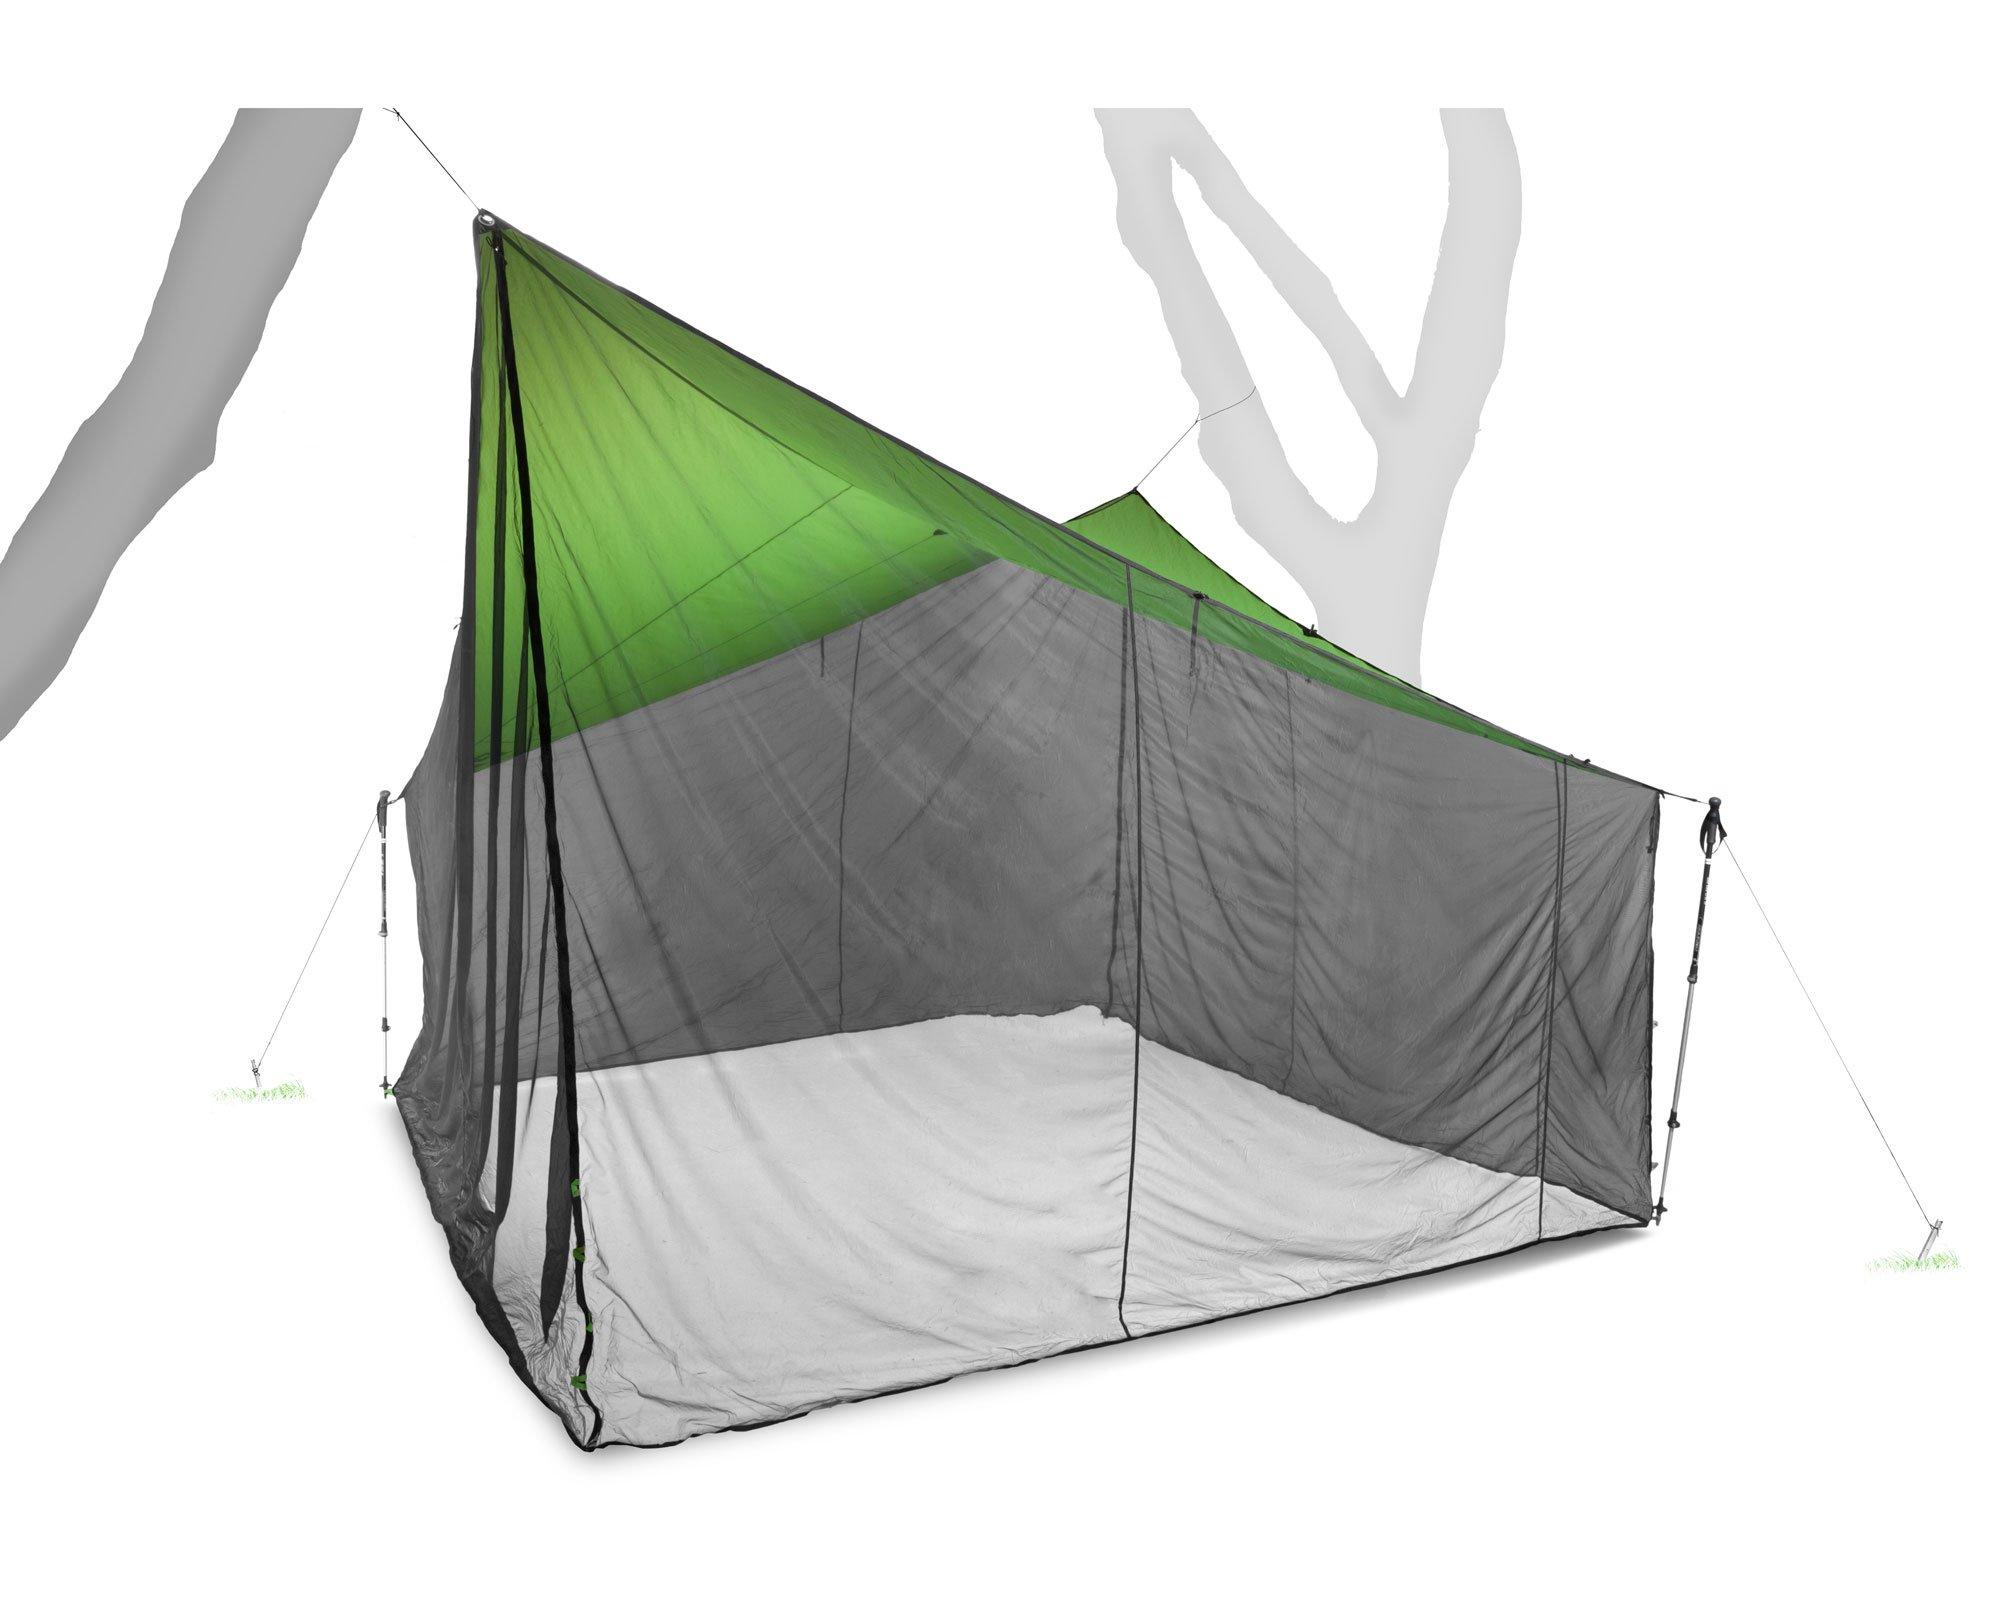 Nemo Equipment Bugout Tent (Green/Black, 12 x 12-Feet) by Nemo Equipment